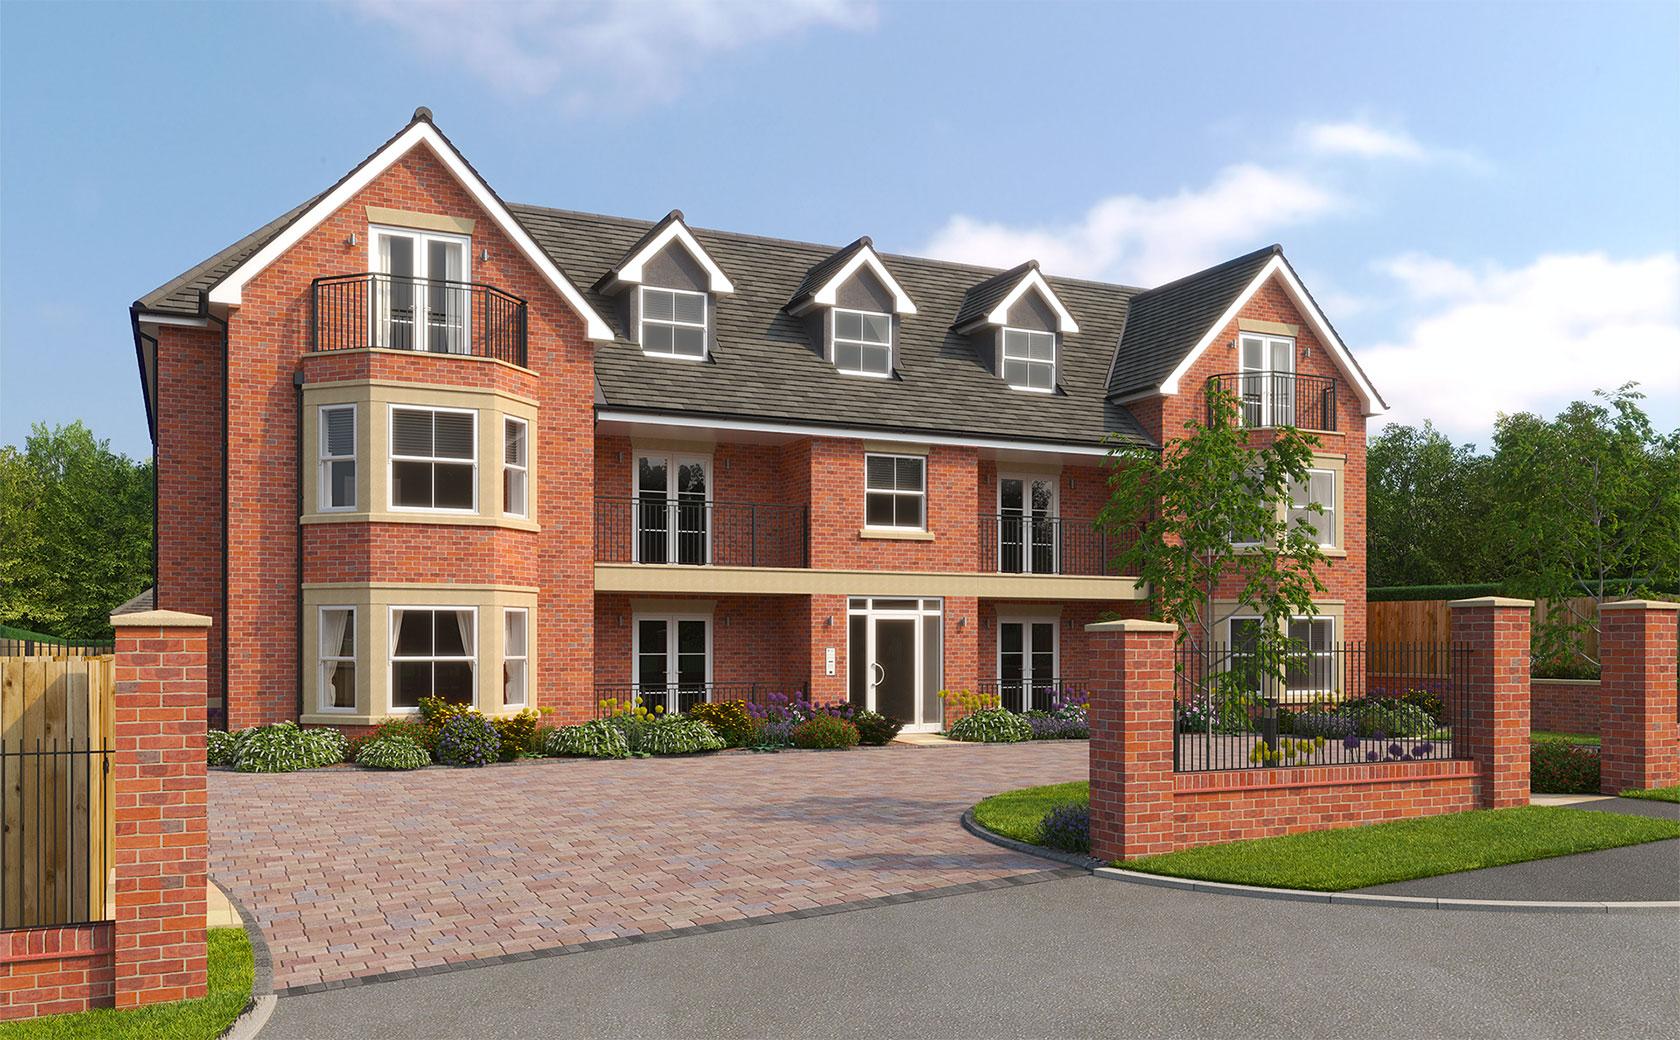 Amberstone Developments Sandgate house